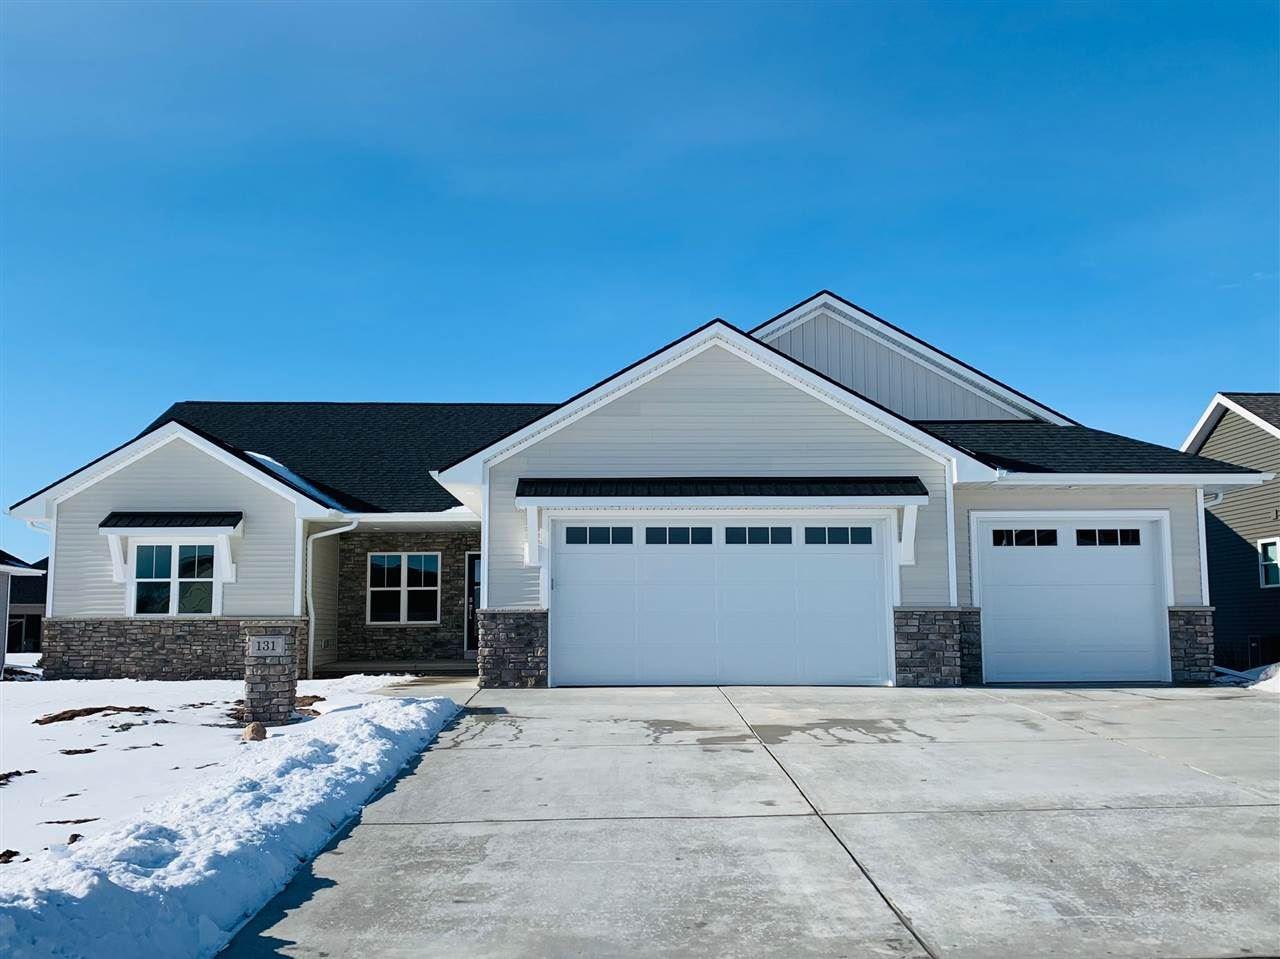 131 PURPLE SAGE Drive, Green Bay, WI 54311 - MLS#: 50235223